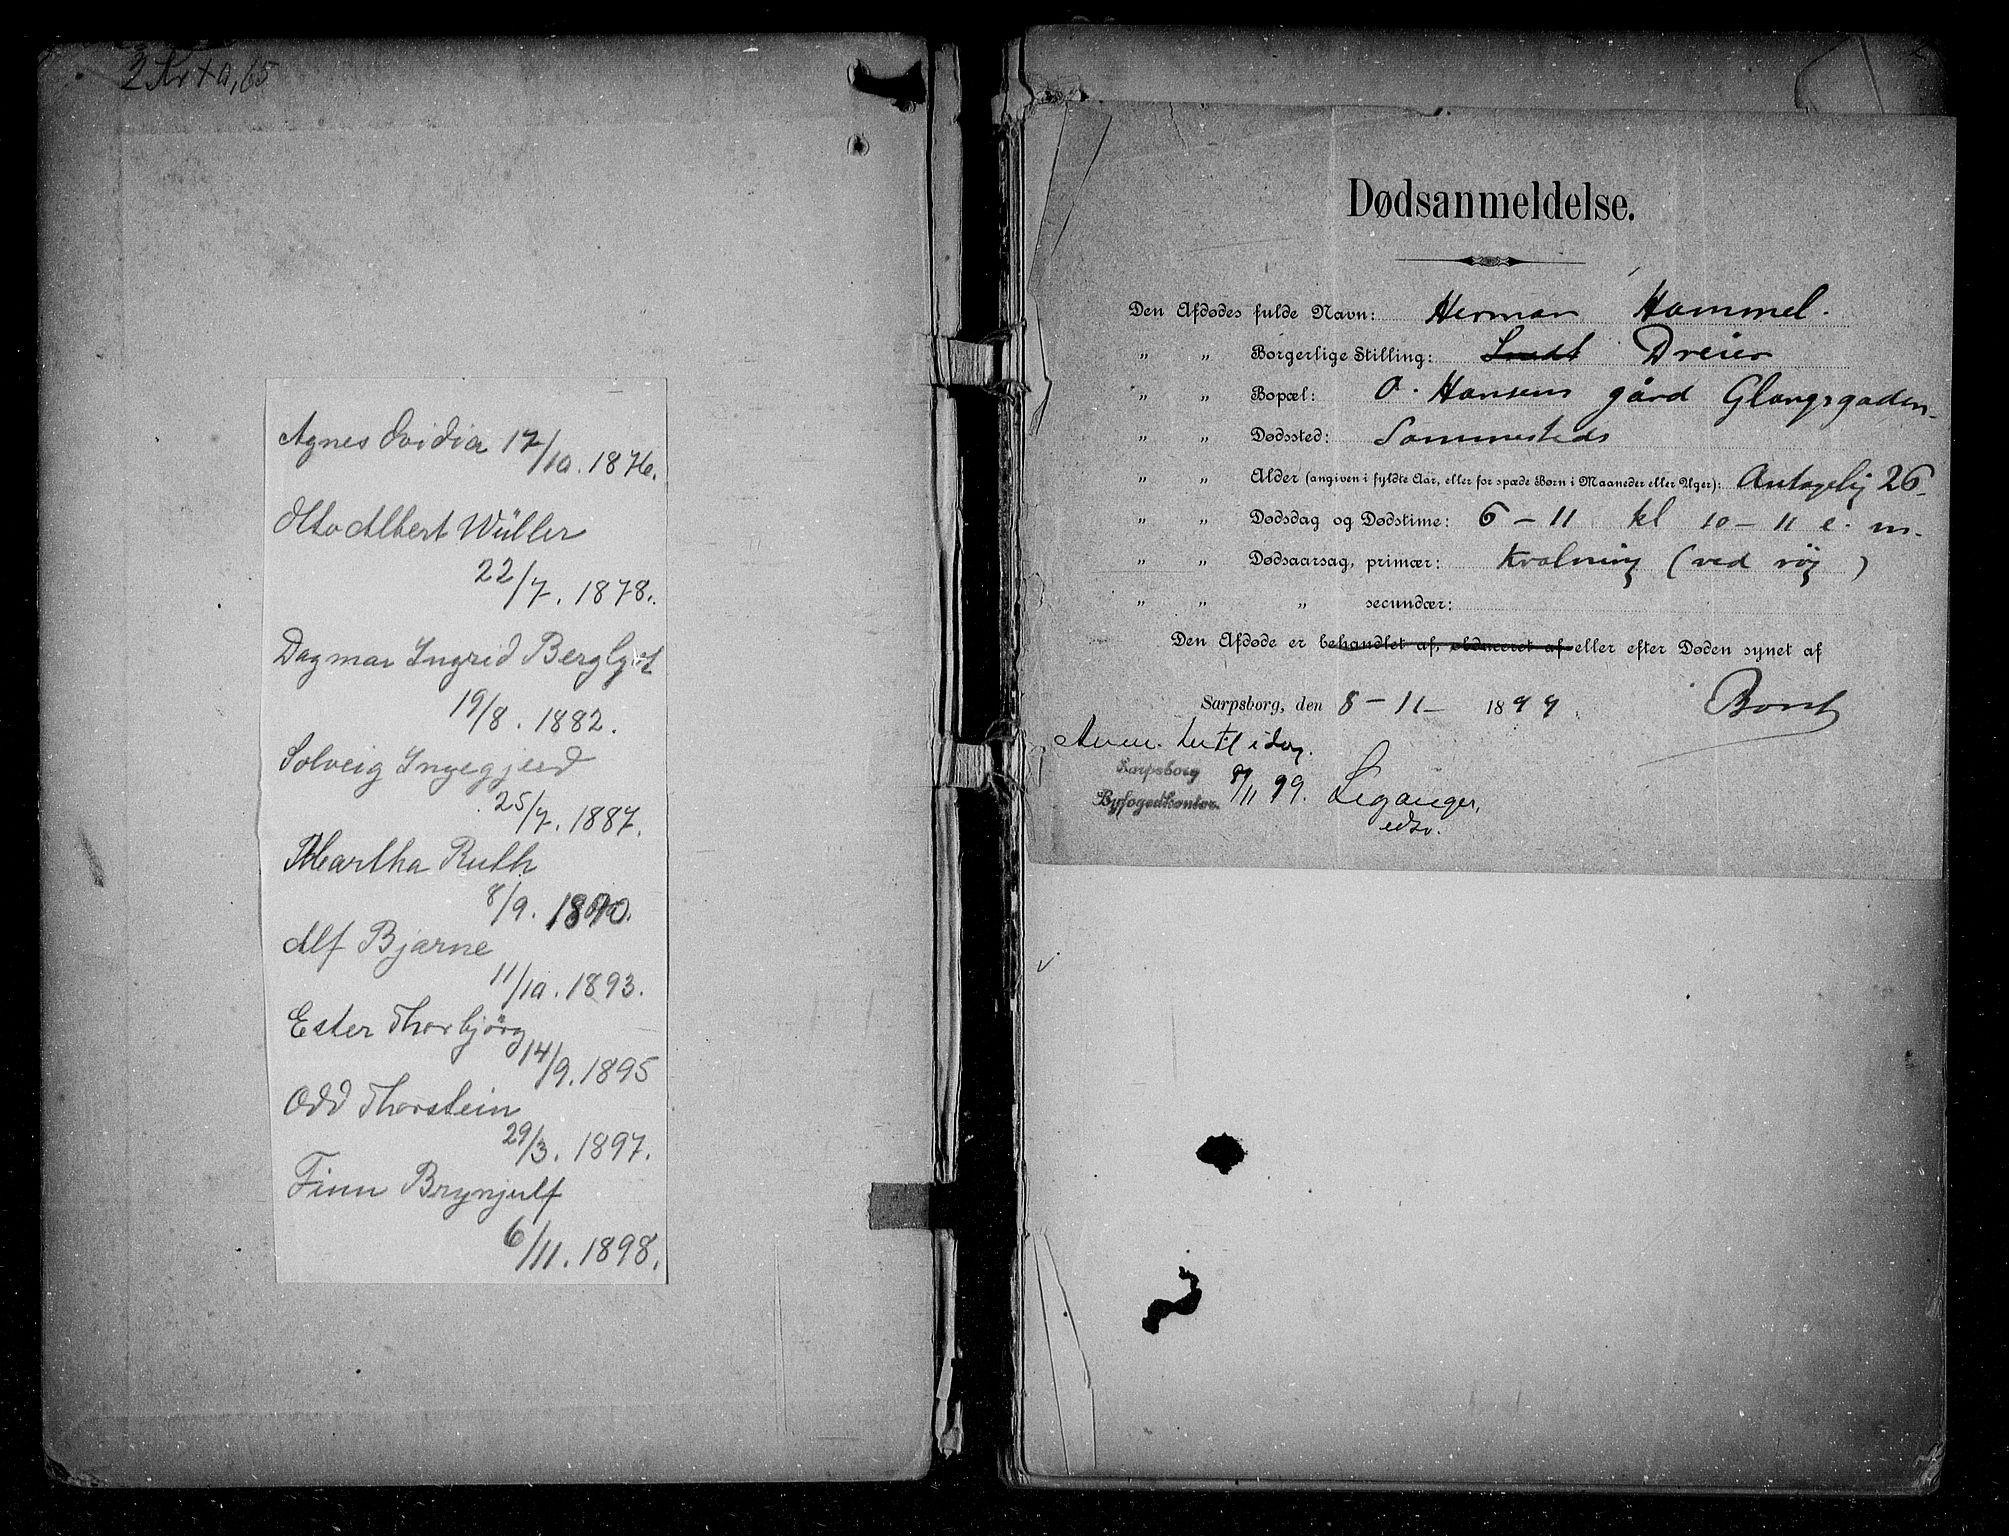 SAO, Sarpsborg byfogd, H/Ha/Haa/L0001: Dødsfallsprotokoll, 1880-1904